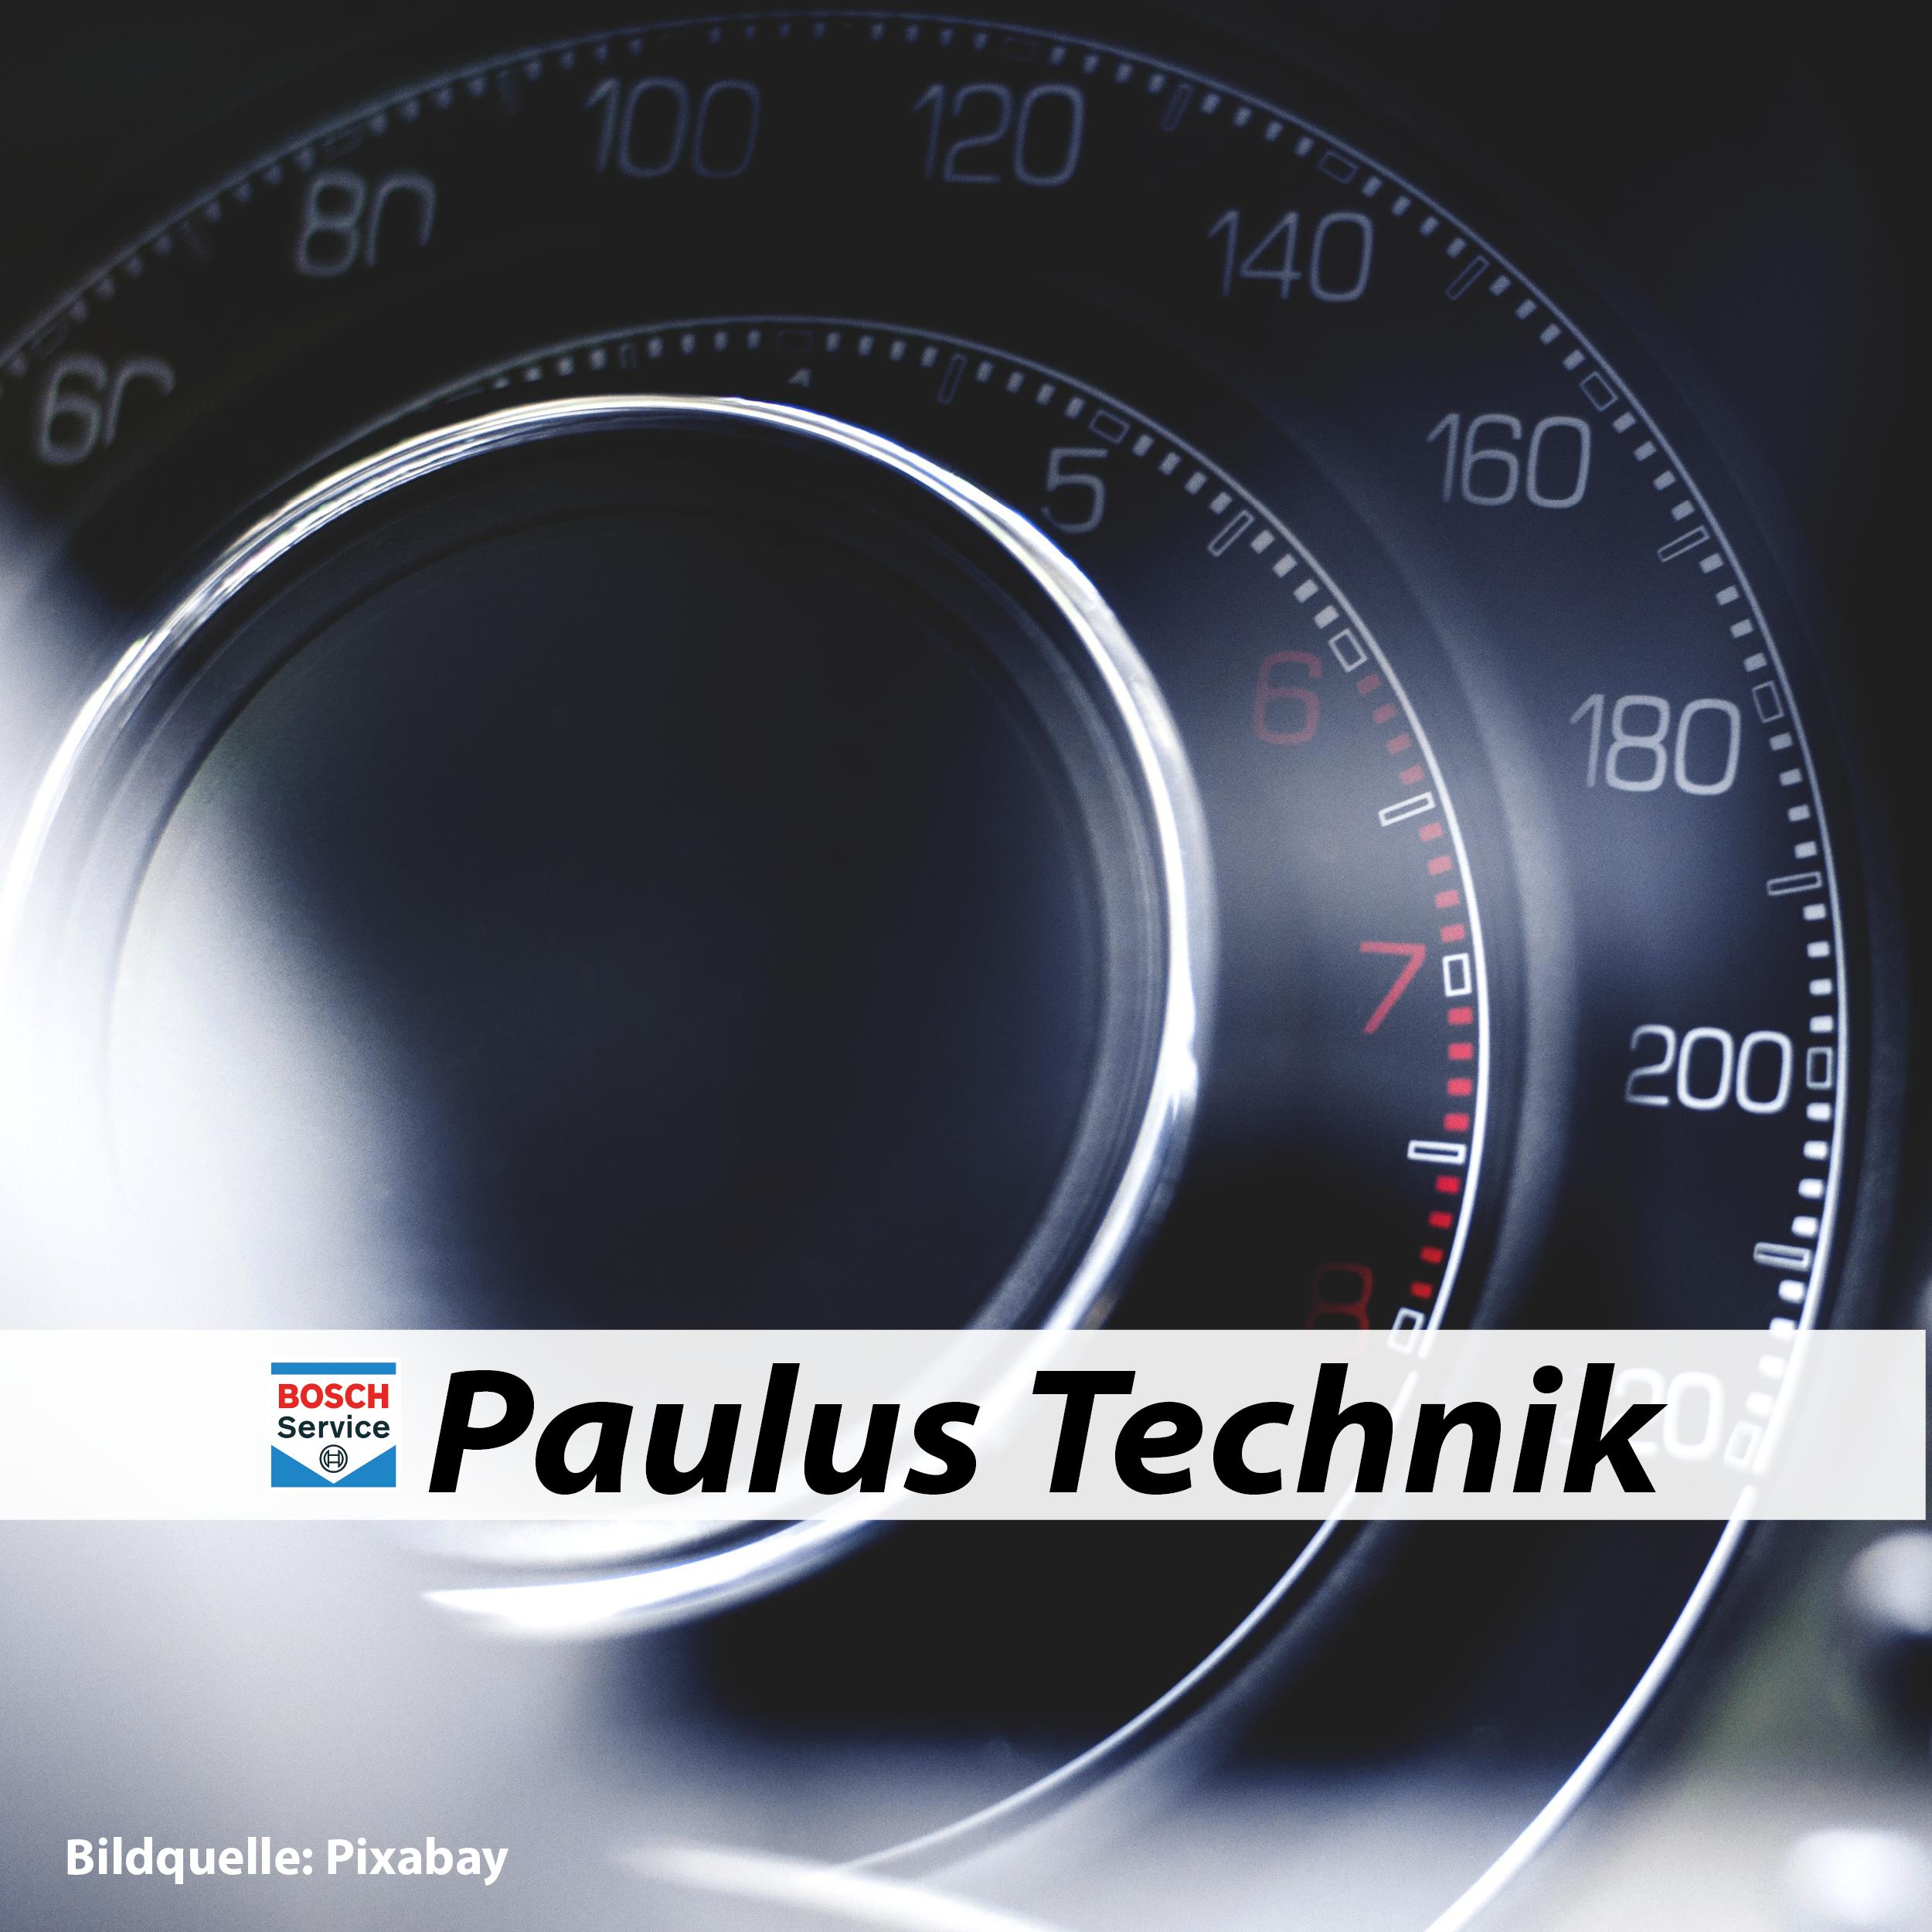 Paulus Technik GmbH & Co. KG